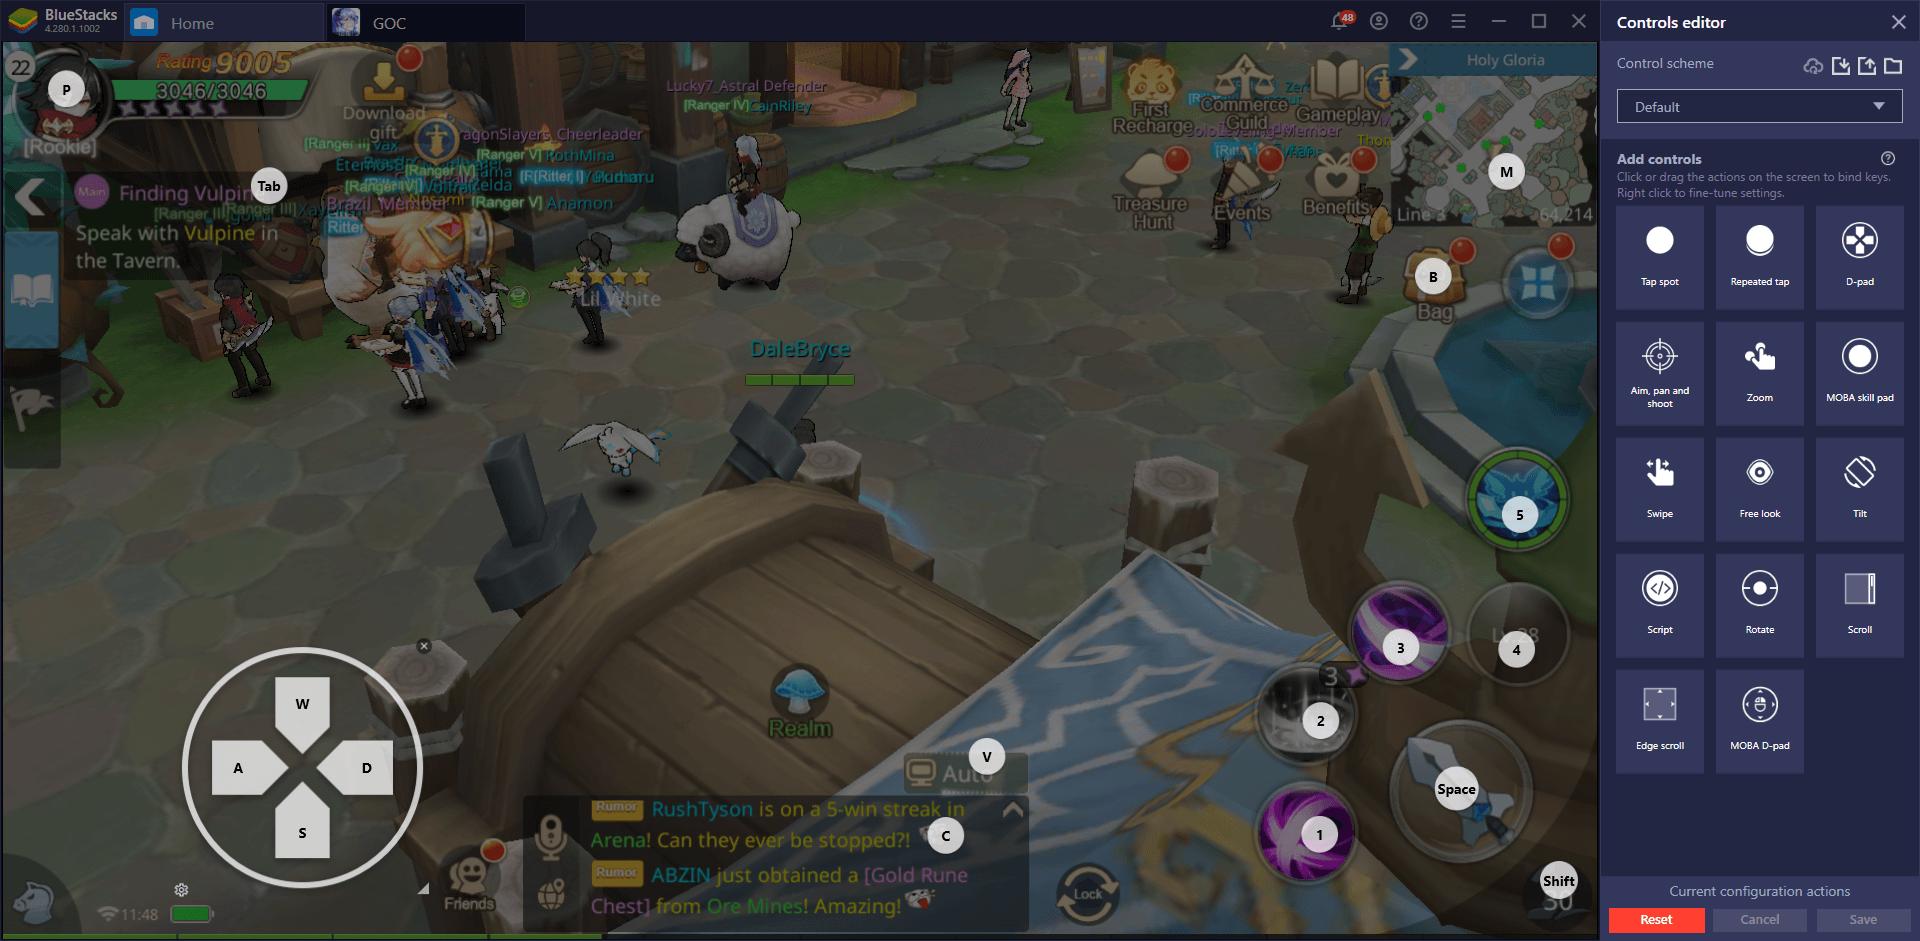 Подсказки для начинающих в Guardians of Cloudia — начните приключение с побед